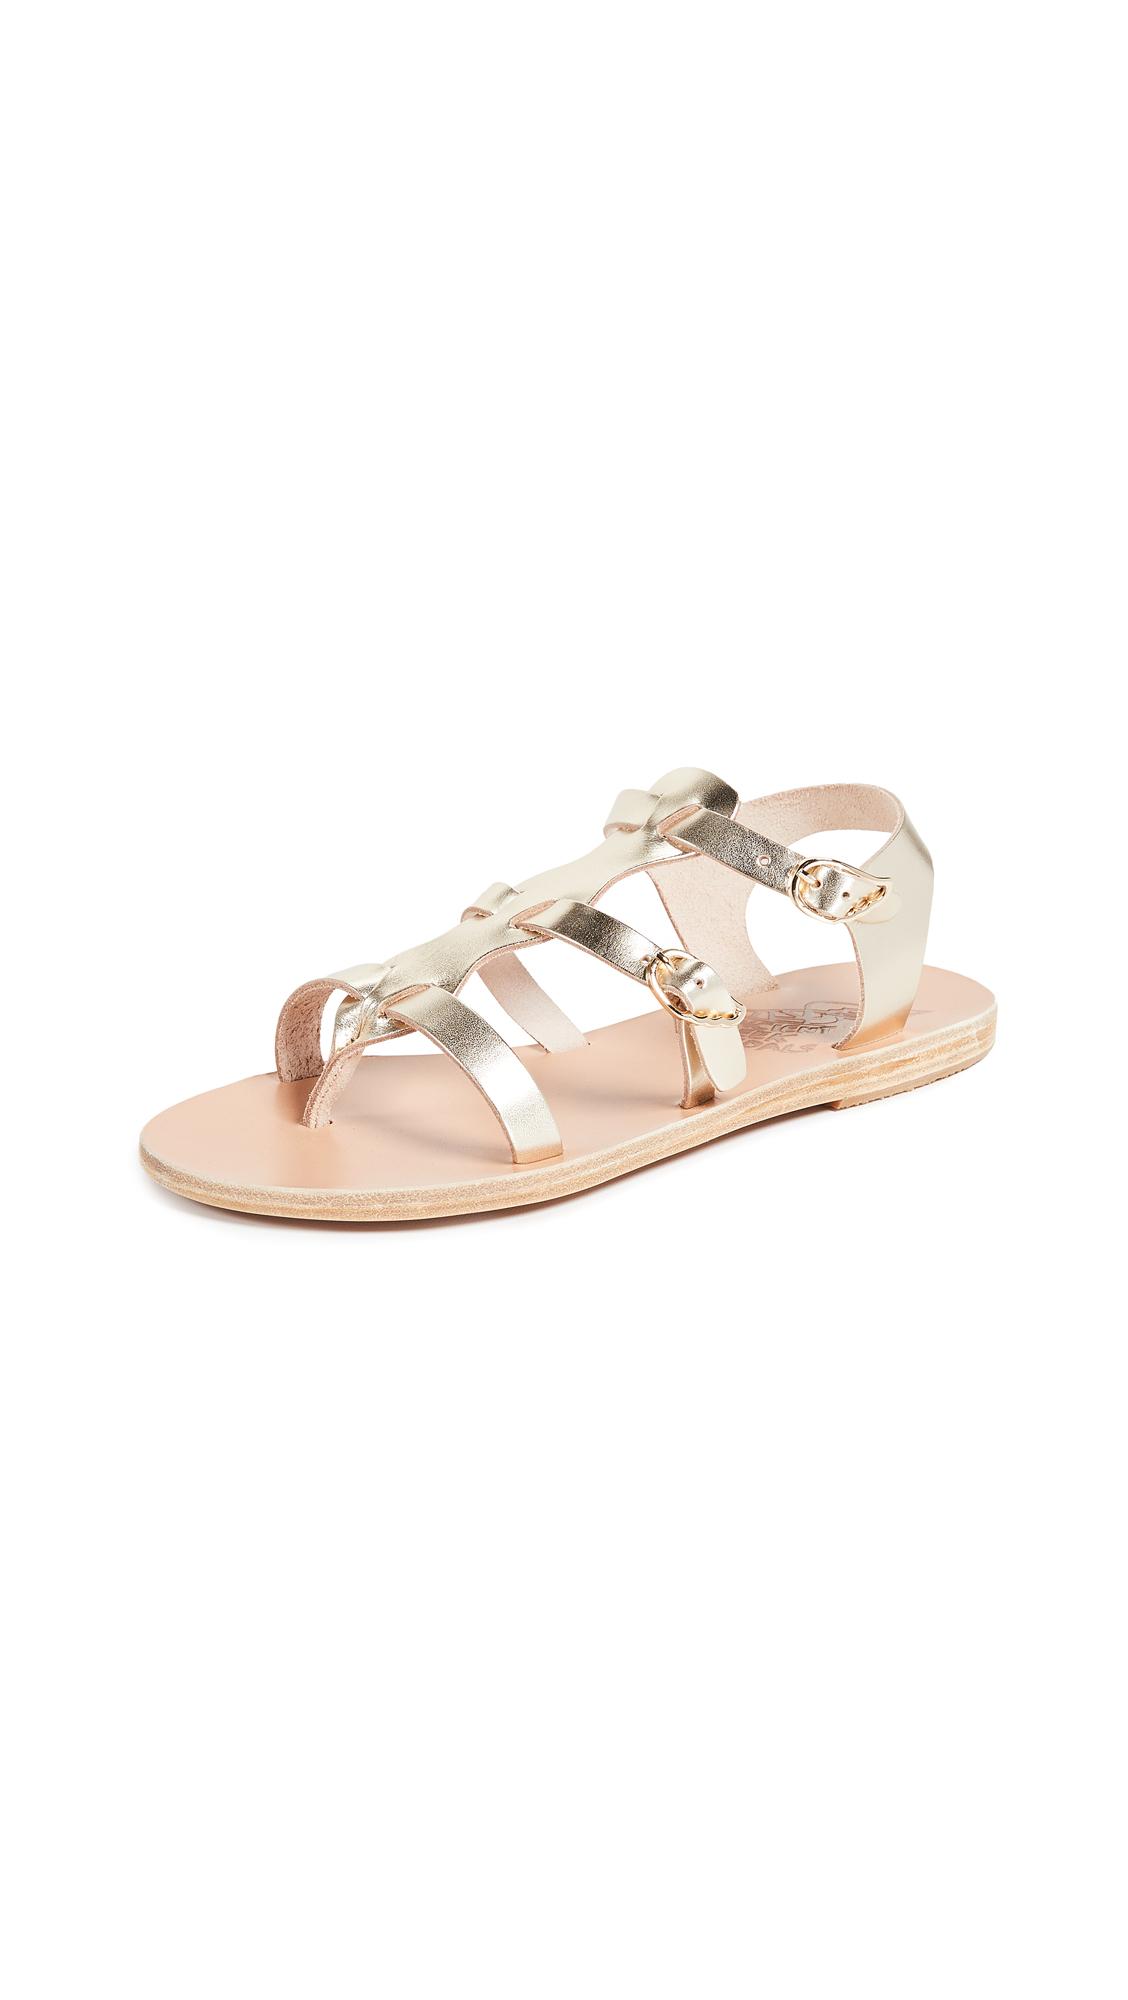 Buy Ancient Greek Sandals Grace Kelly Sandals online, shop Ancient Greek Sandals